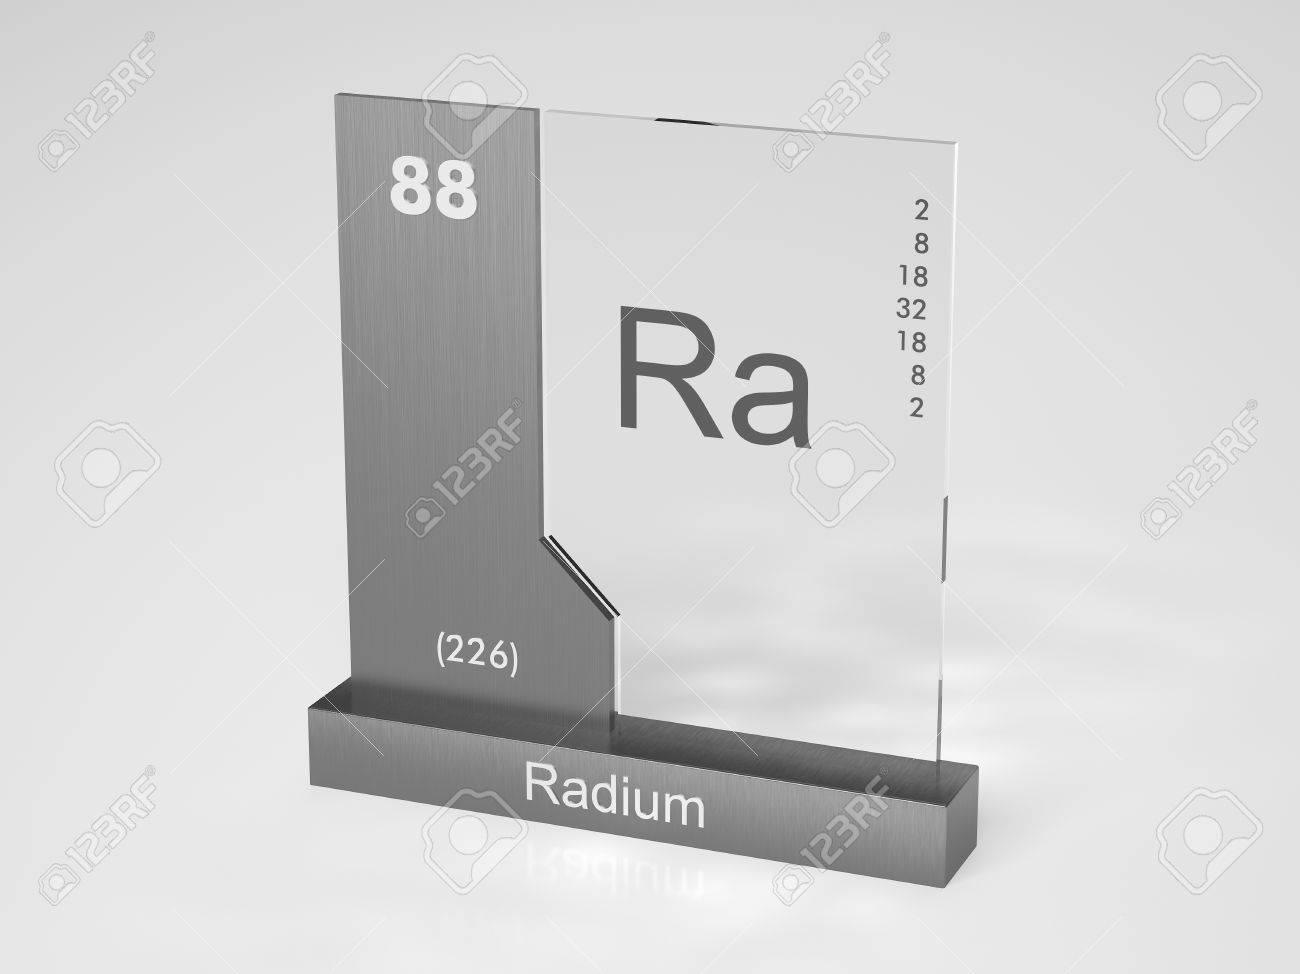 Radio smbolo de ra elemento qumico de la tabla peridica radio smbolo de ra elemento qumico de la tabla peridica foto de archivo urtaz Choice Image